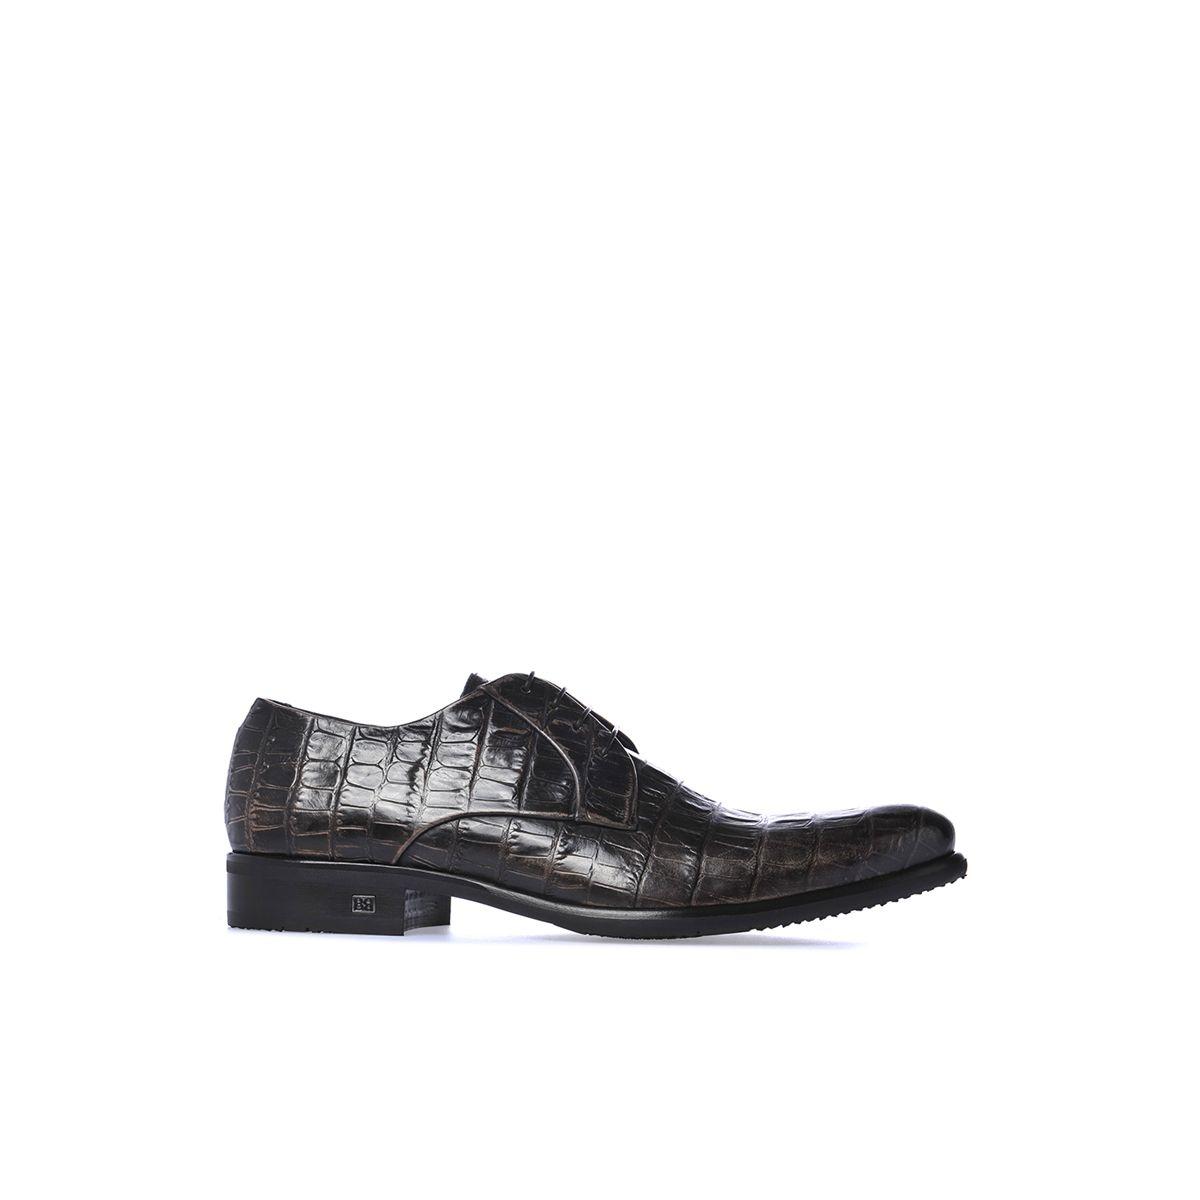 Baldinini Man Collection: Derby shoes in dark blue printed crocodile #DerbyShoes #Baldinini